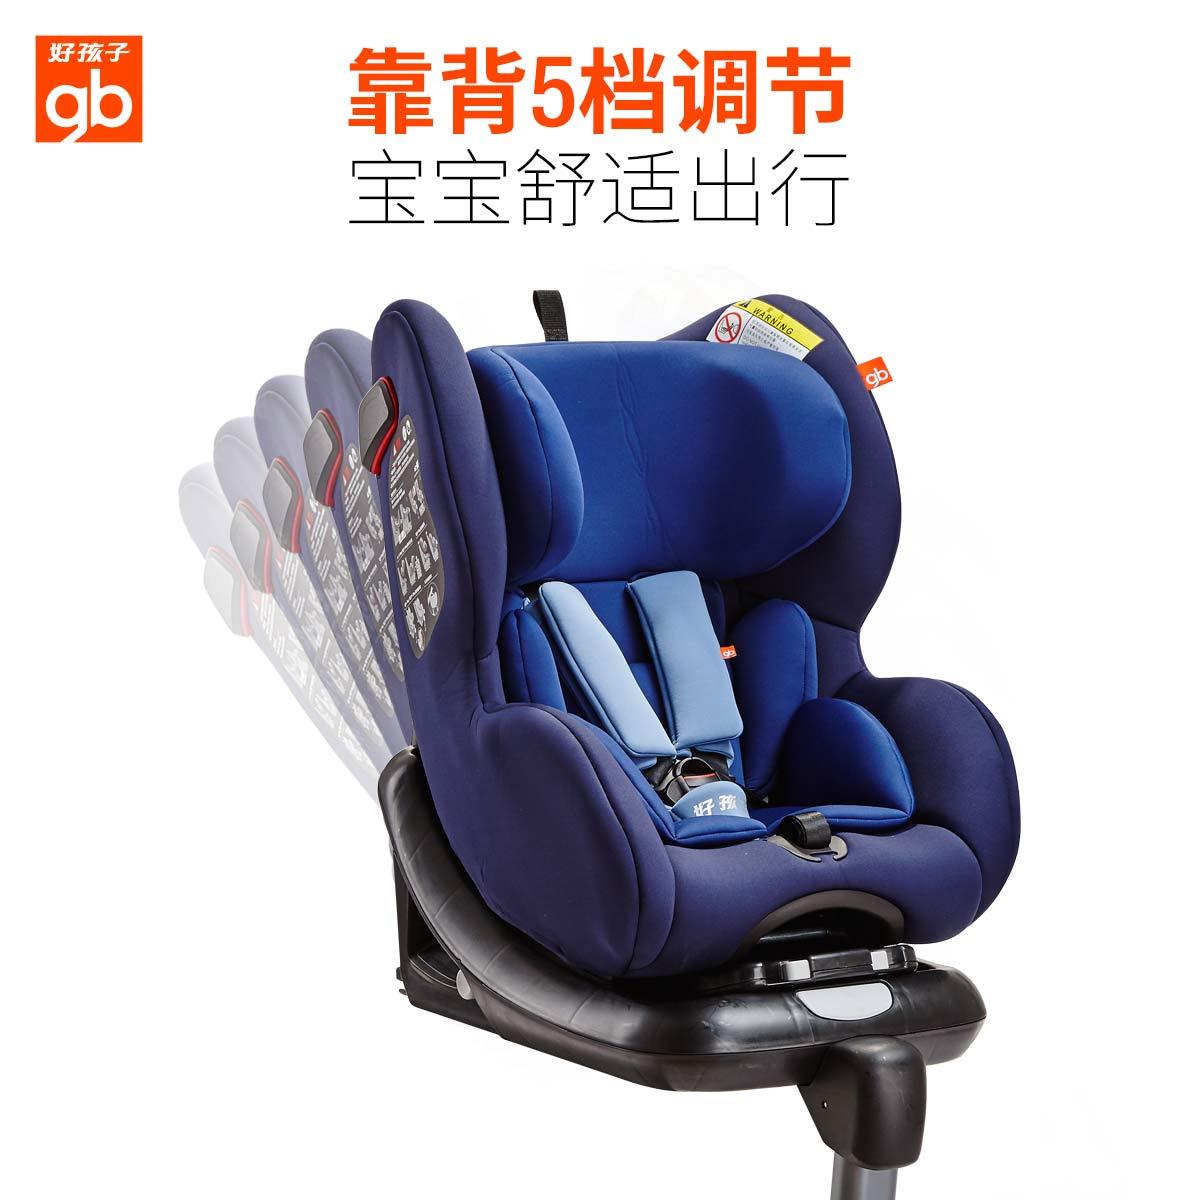 gb好孩子汽车儿童安全座椅婴儿宝宝座椅ISOfix接口可躺通用CS768